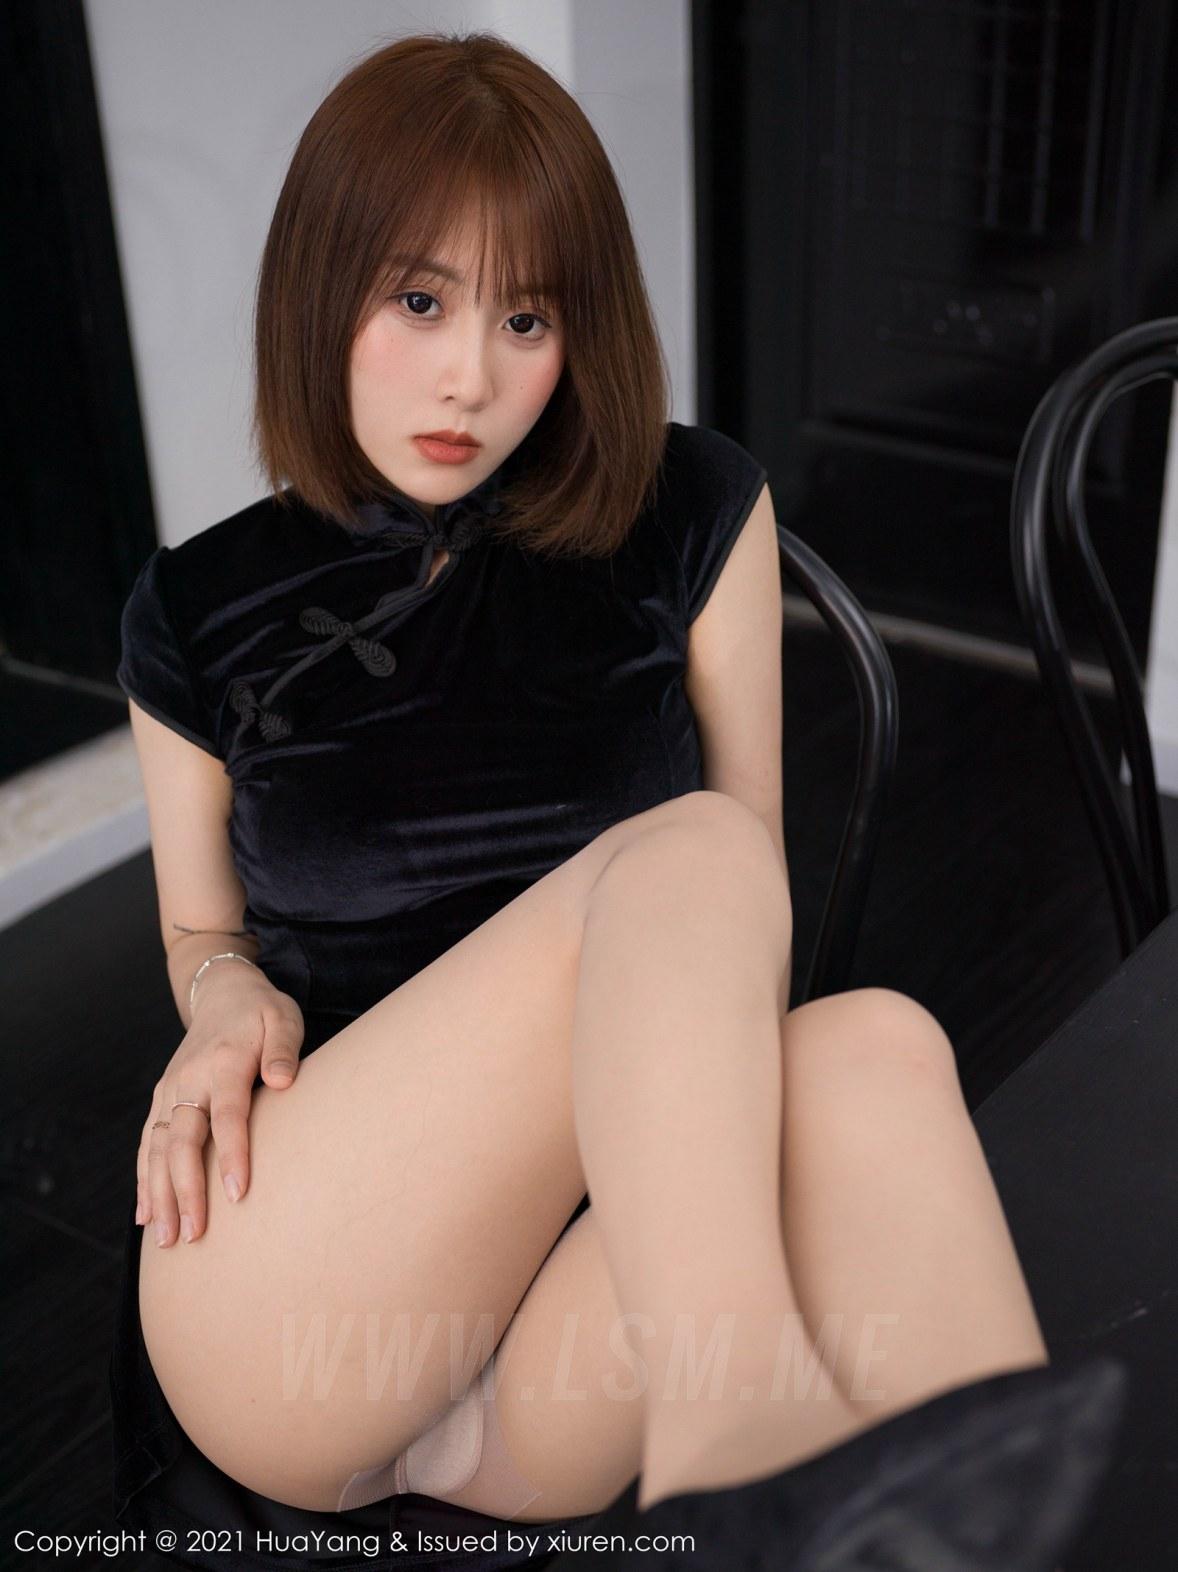 HuaYang 花漾show Vol.428 新人模特 恬恬GuTIan 旗袍与魅惑丝袜第... - 4